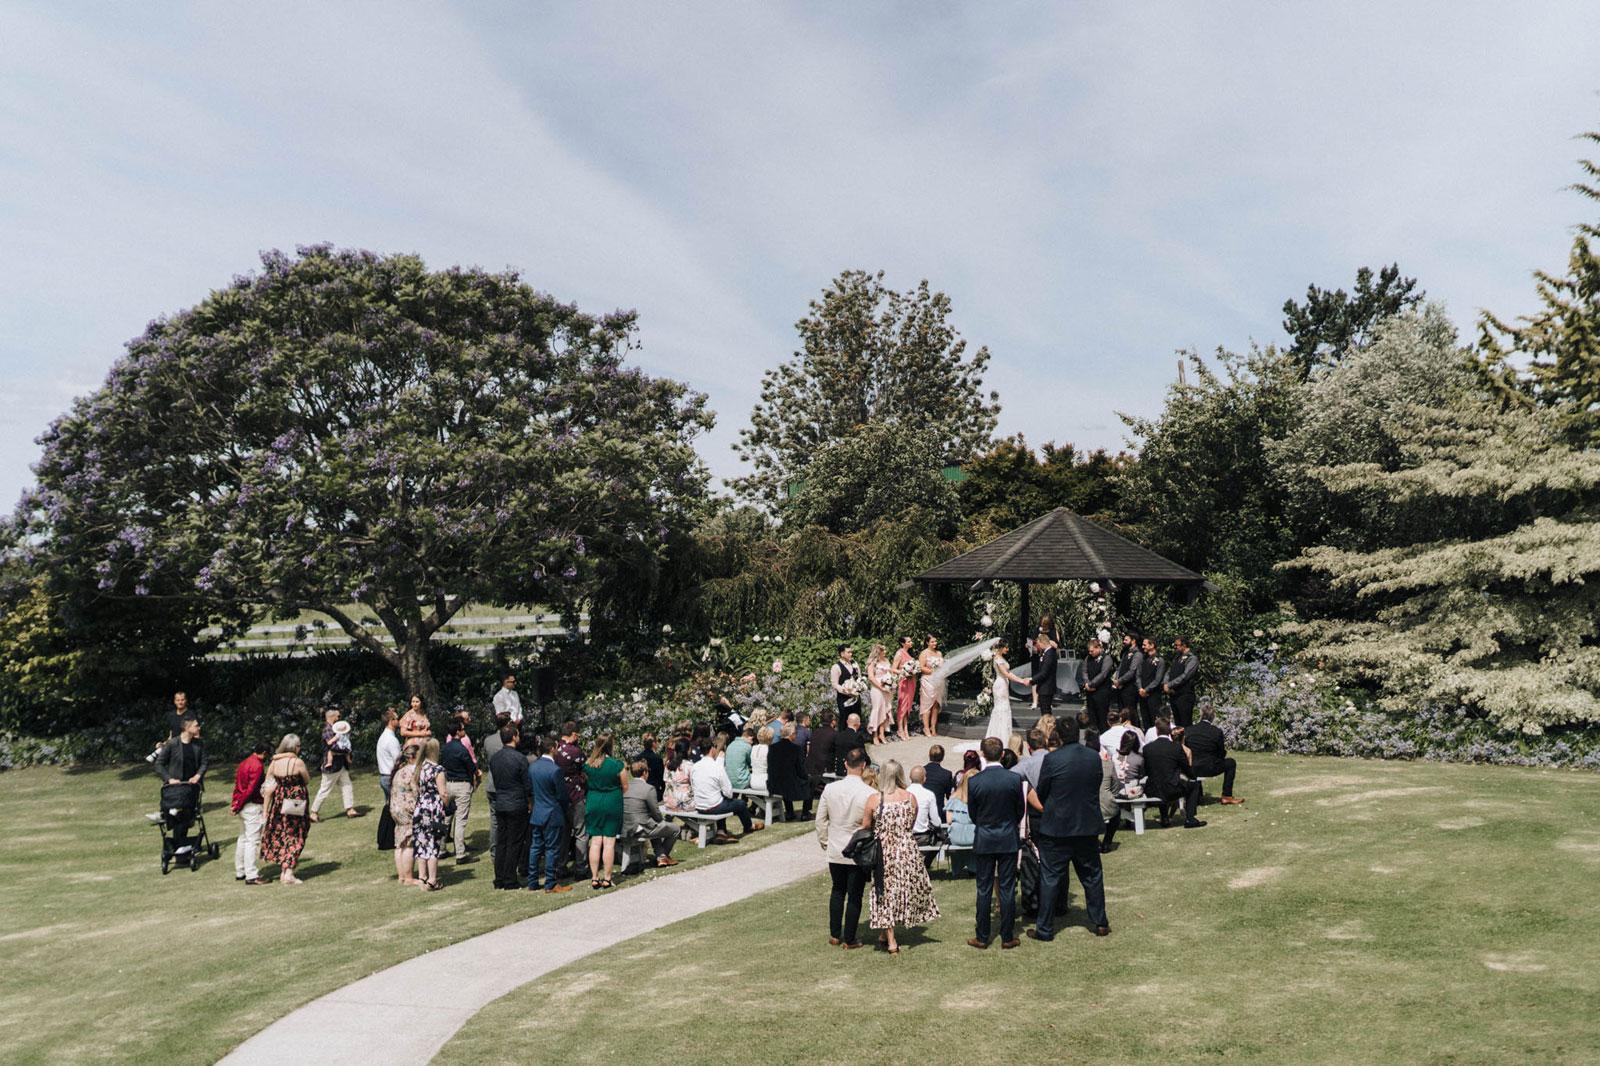 newfound-n-c-olive-tree-cottage-tauranga-wedding-photographer-426